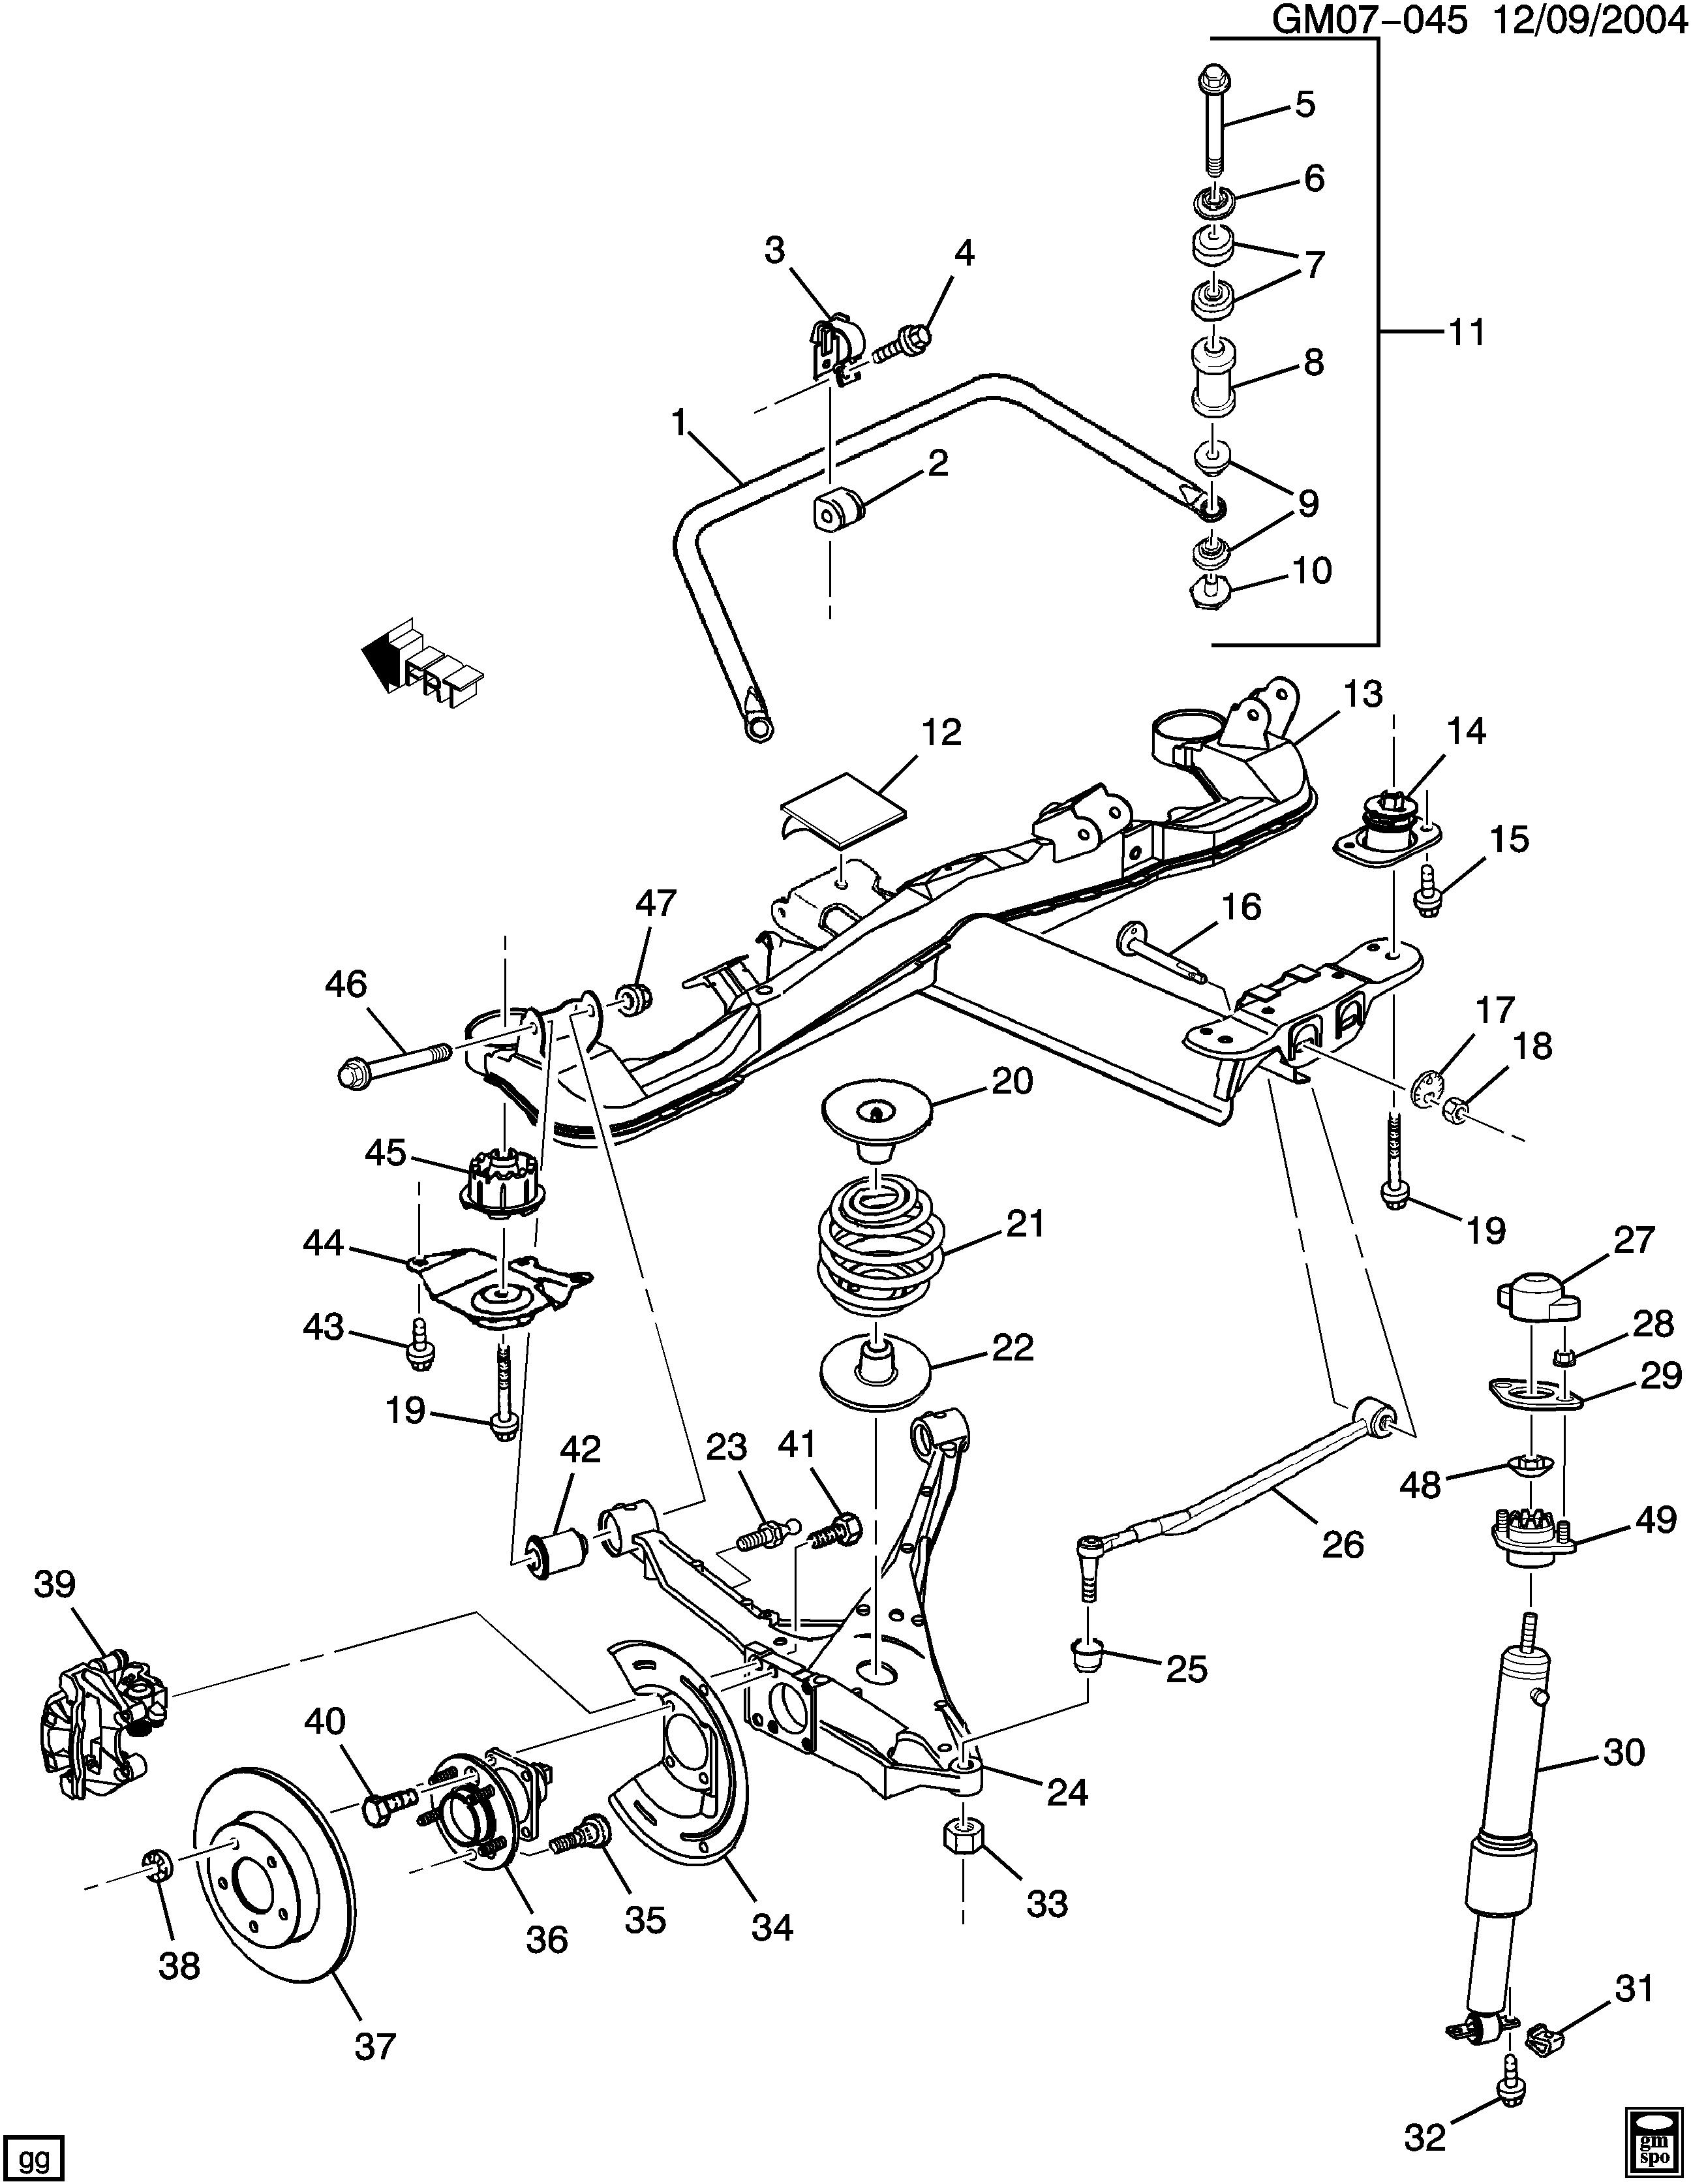 Seananon Jopower 2005 Buick Rendezvous Brake Line Diagram